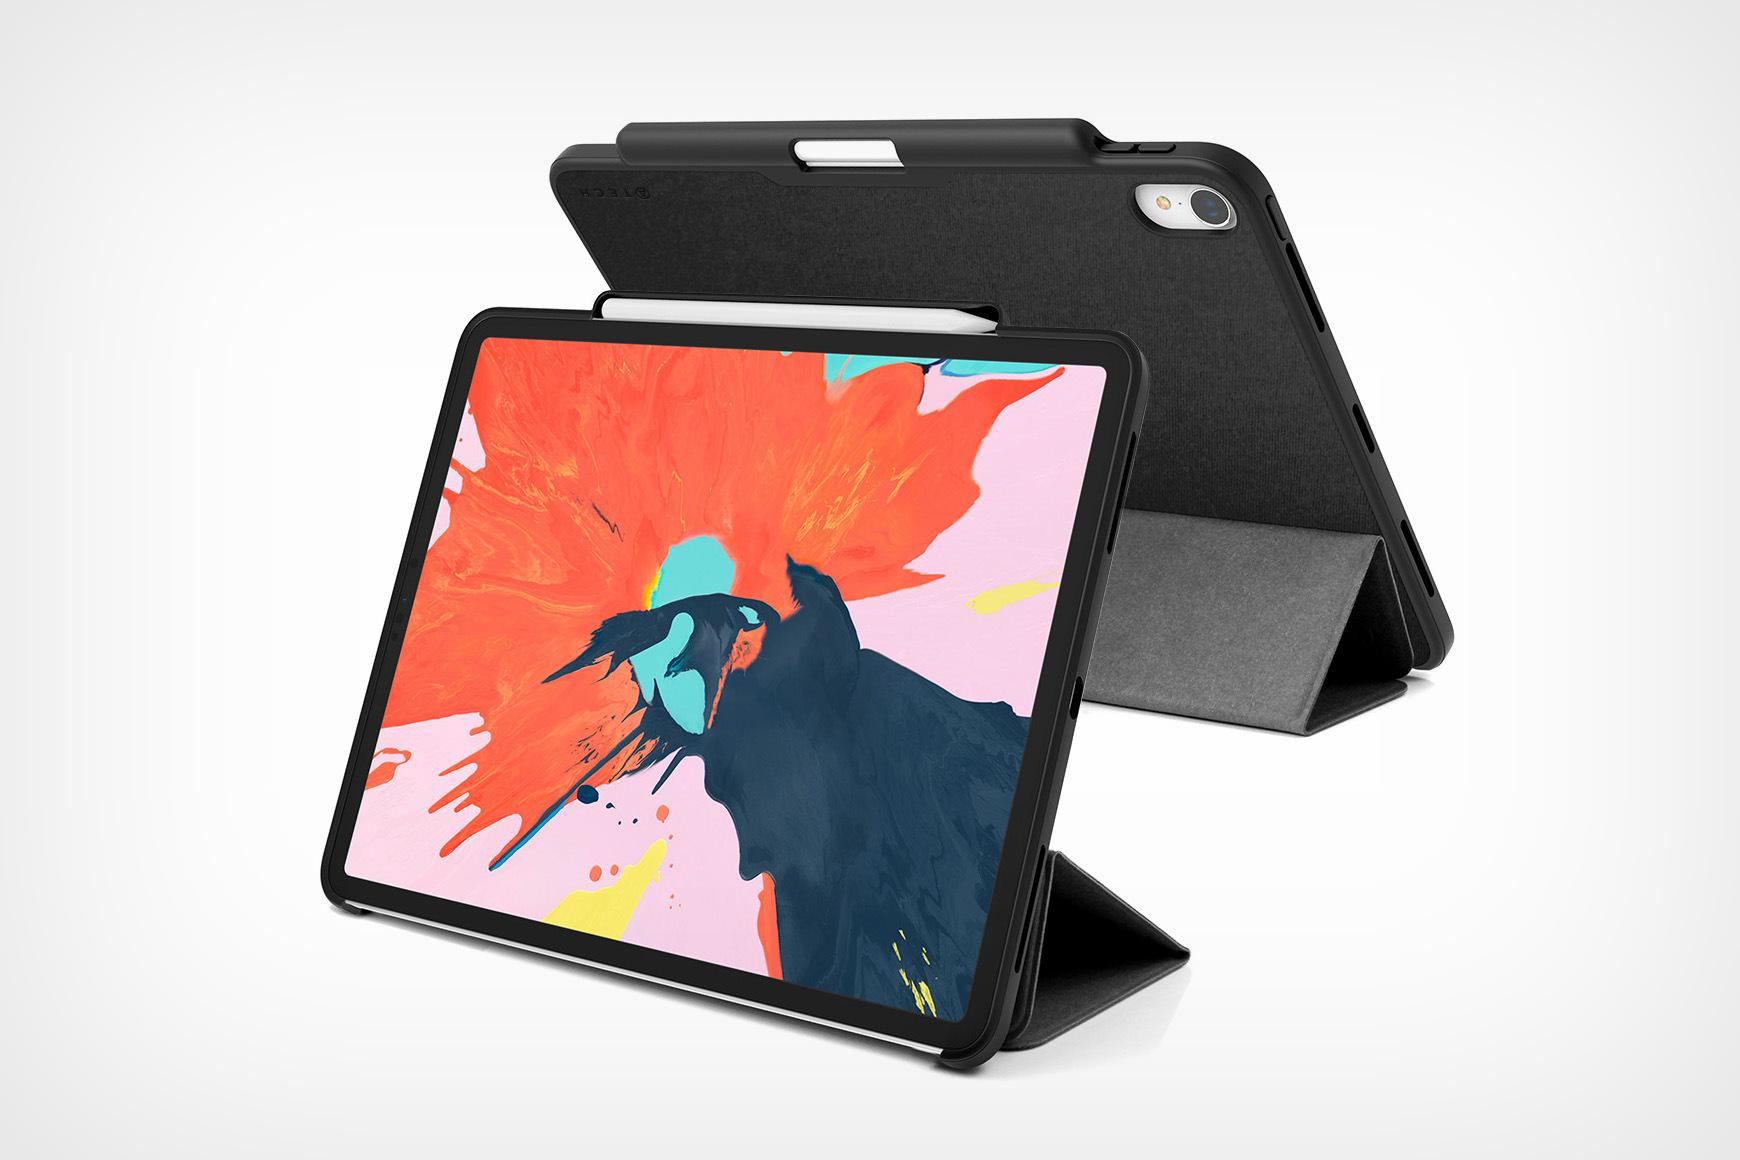 Atech S Ipad Pro Case Sports A Pencil Holder For Docking And Charging Yanko Design,Bridal Lehenga Lehenga Blouse Designs Catalogue 2020